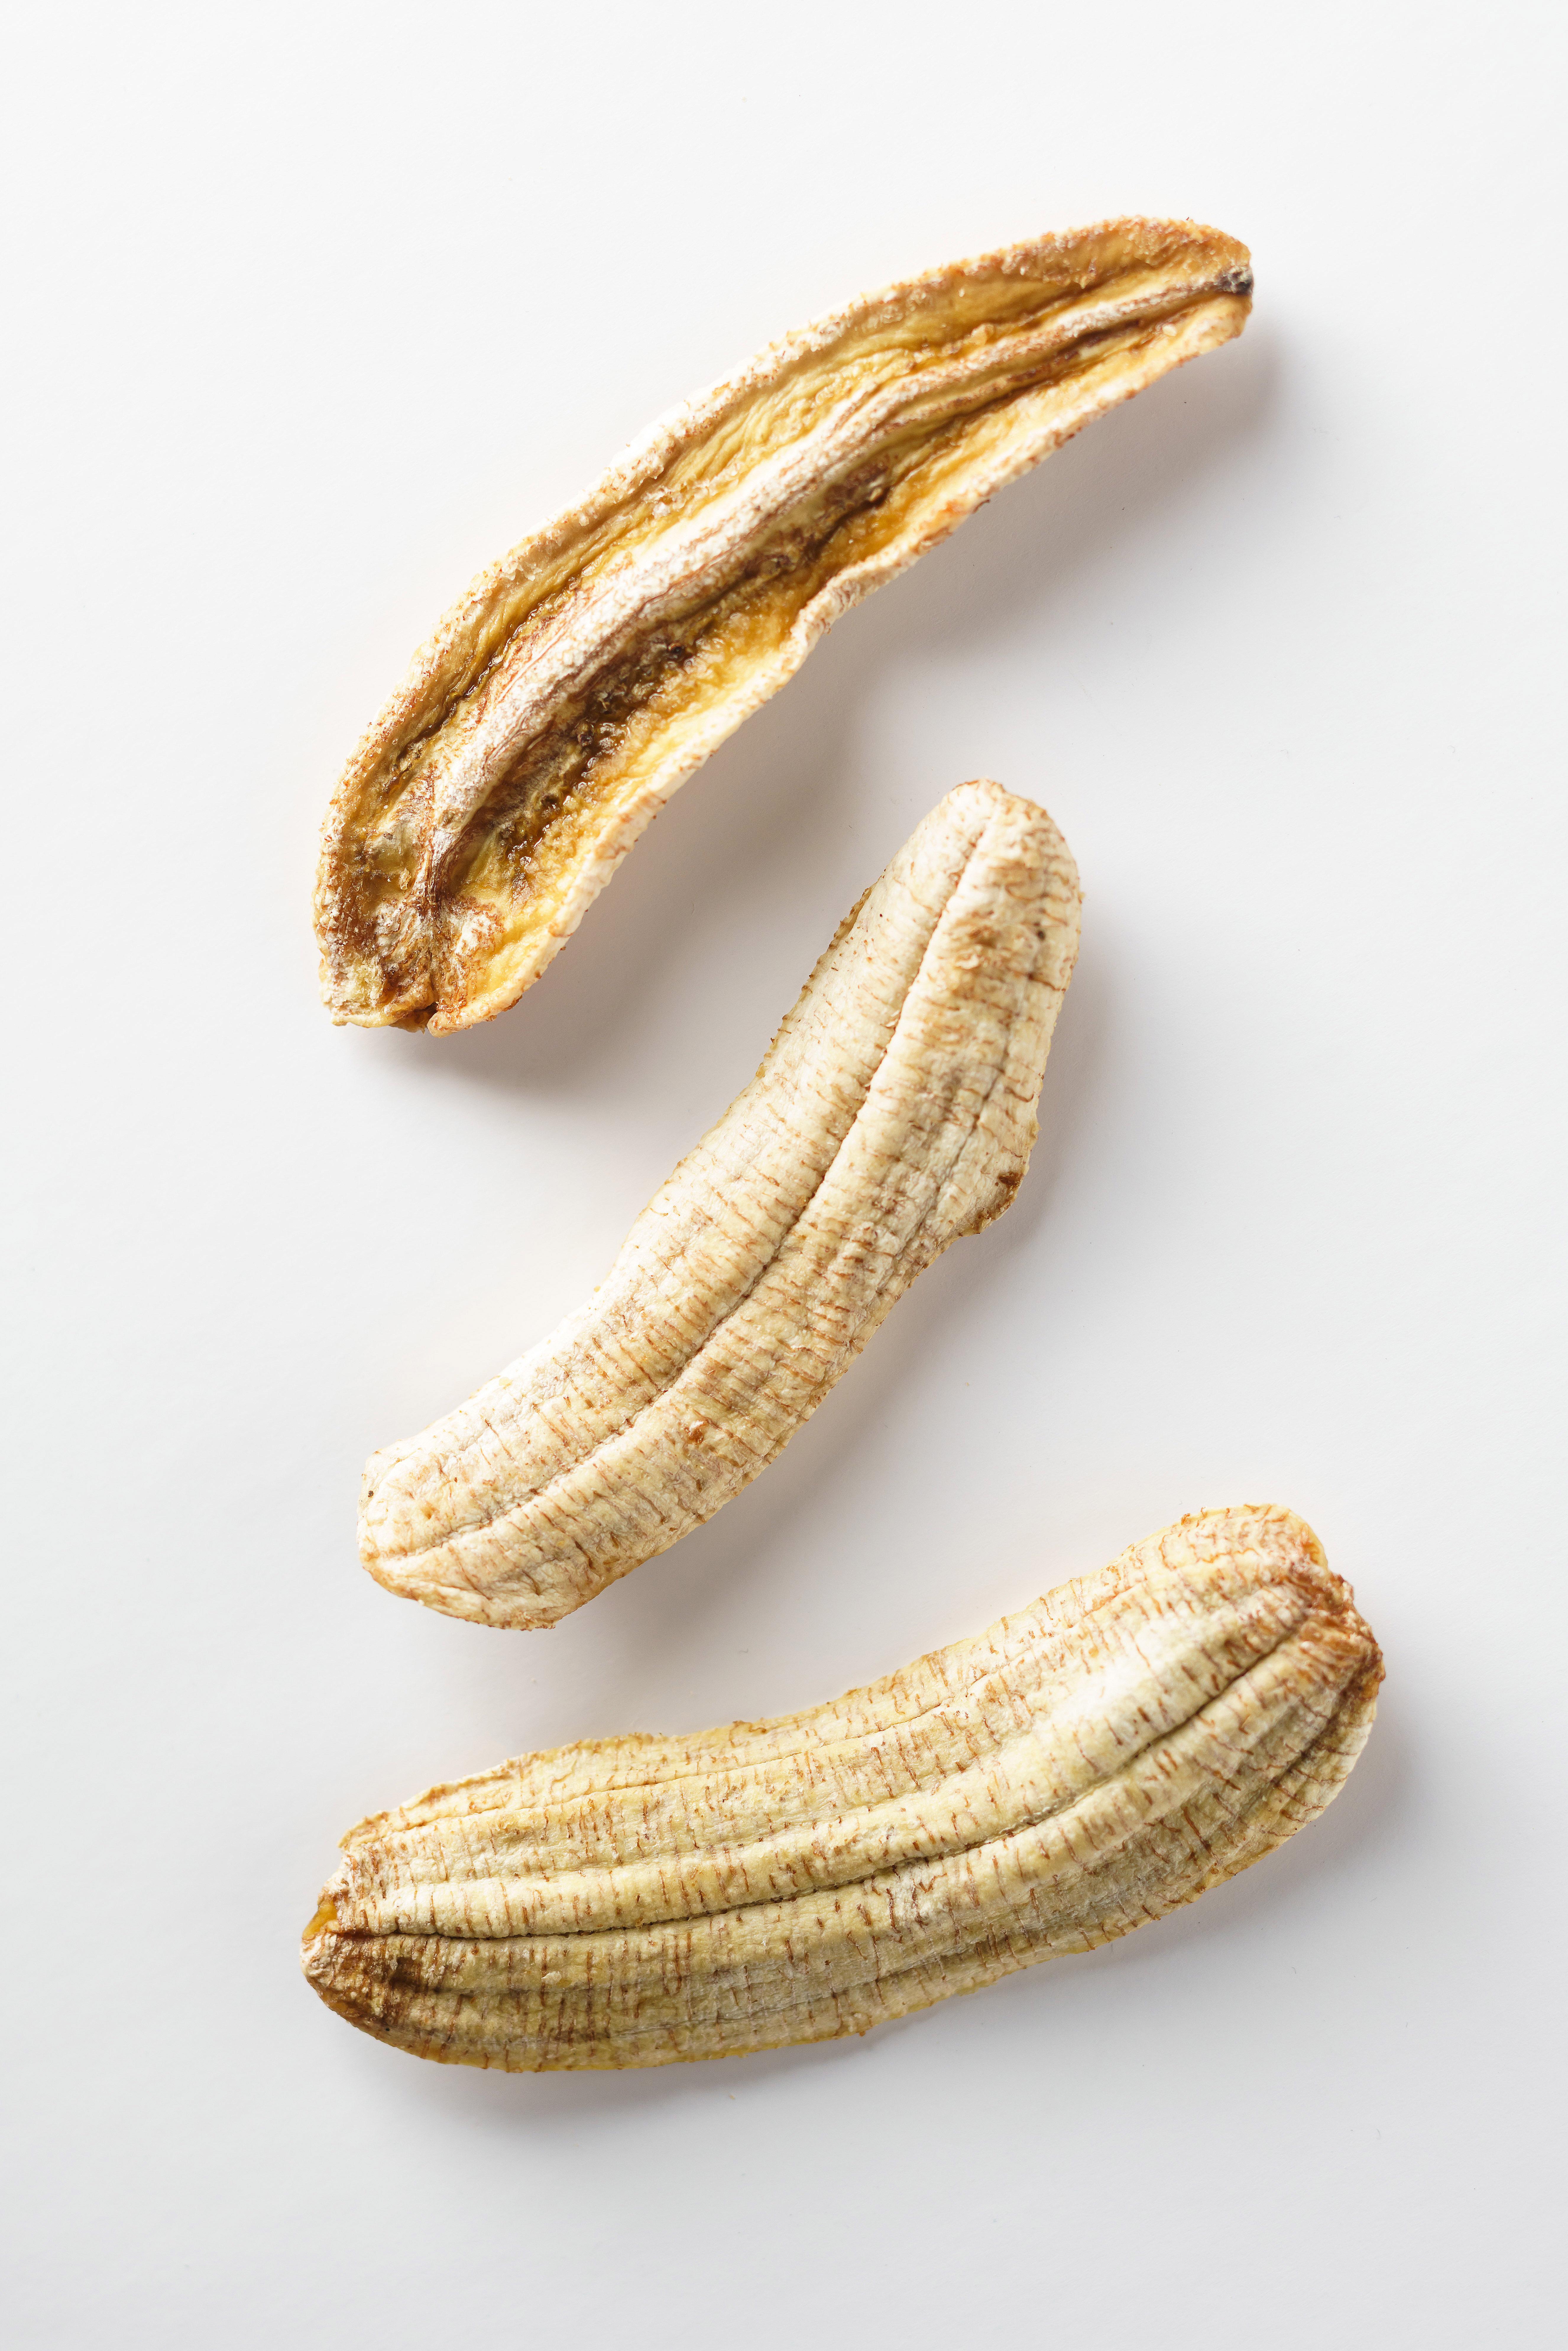 Dry Fruits Banane bio séchée en vrac de Supersec